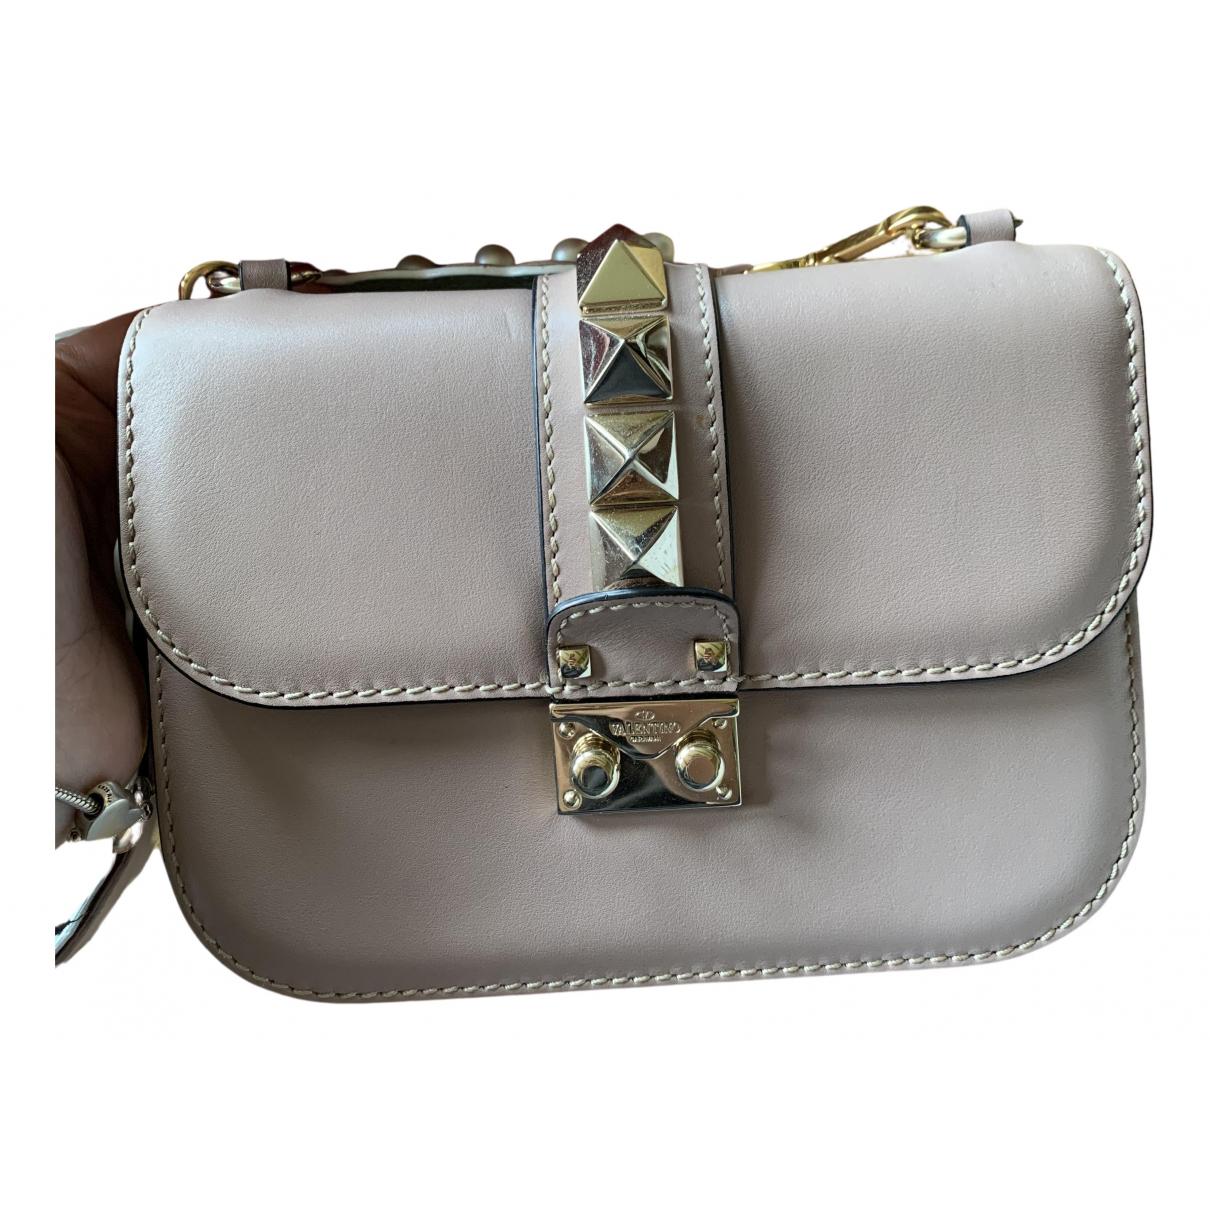 Valentino Garavani Glam Lock Pink Leather handbag for Women N